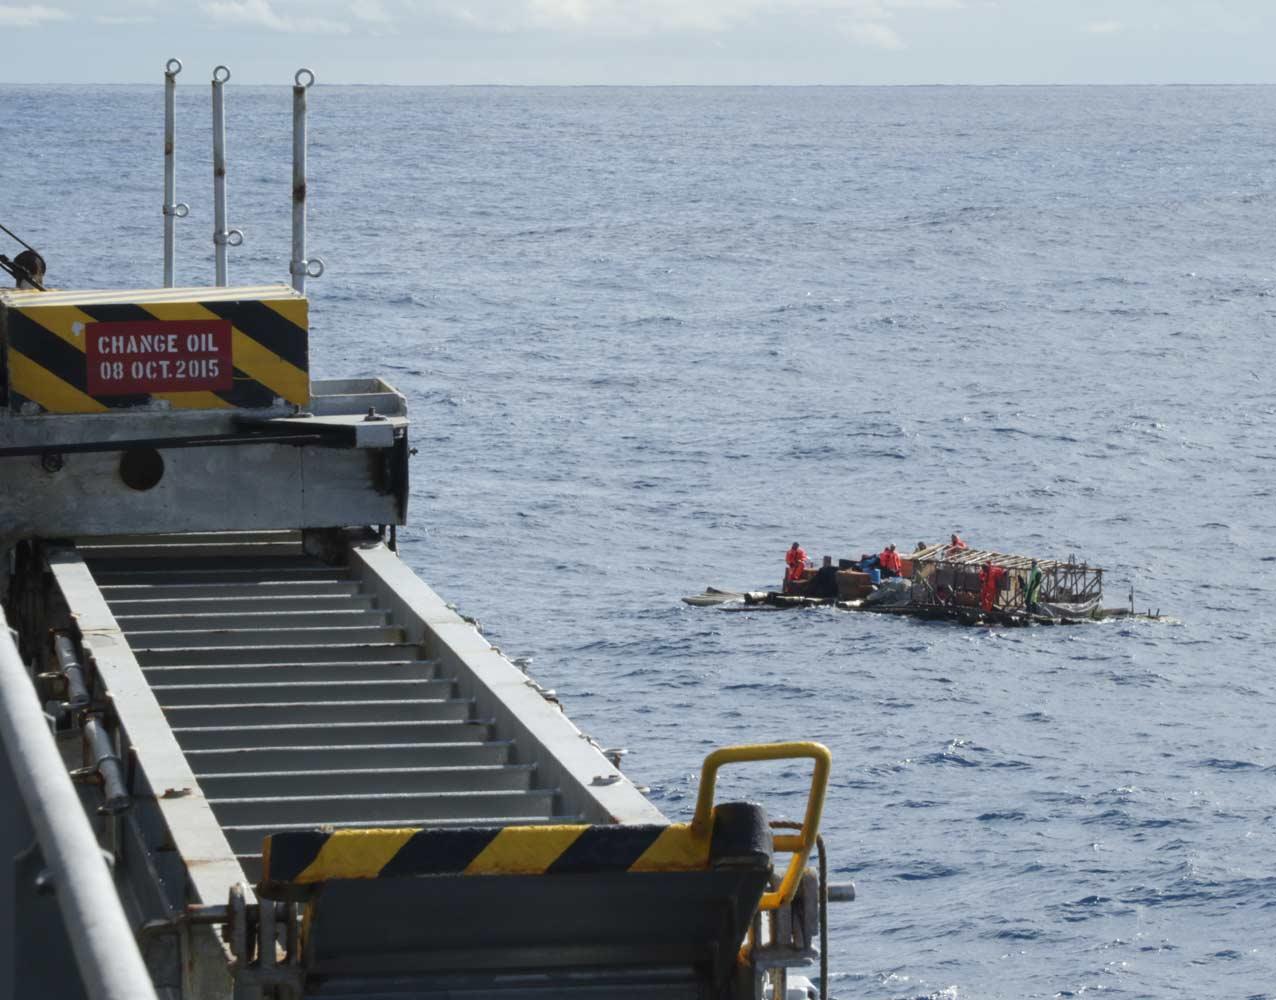 Плот подходит к «Hokuetsu Ushaka». Завершение экспедиции «Кон-Тики 2»